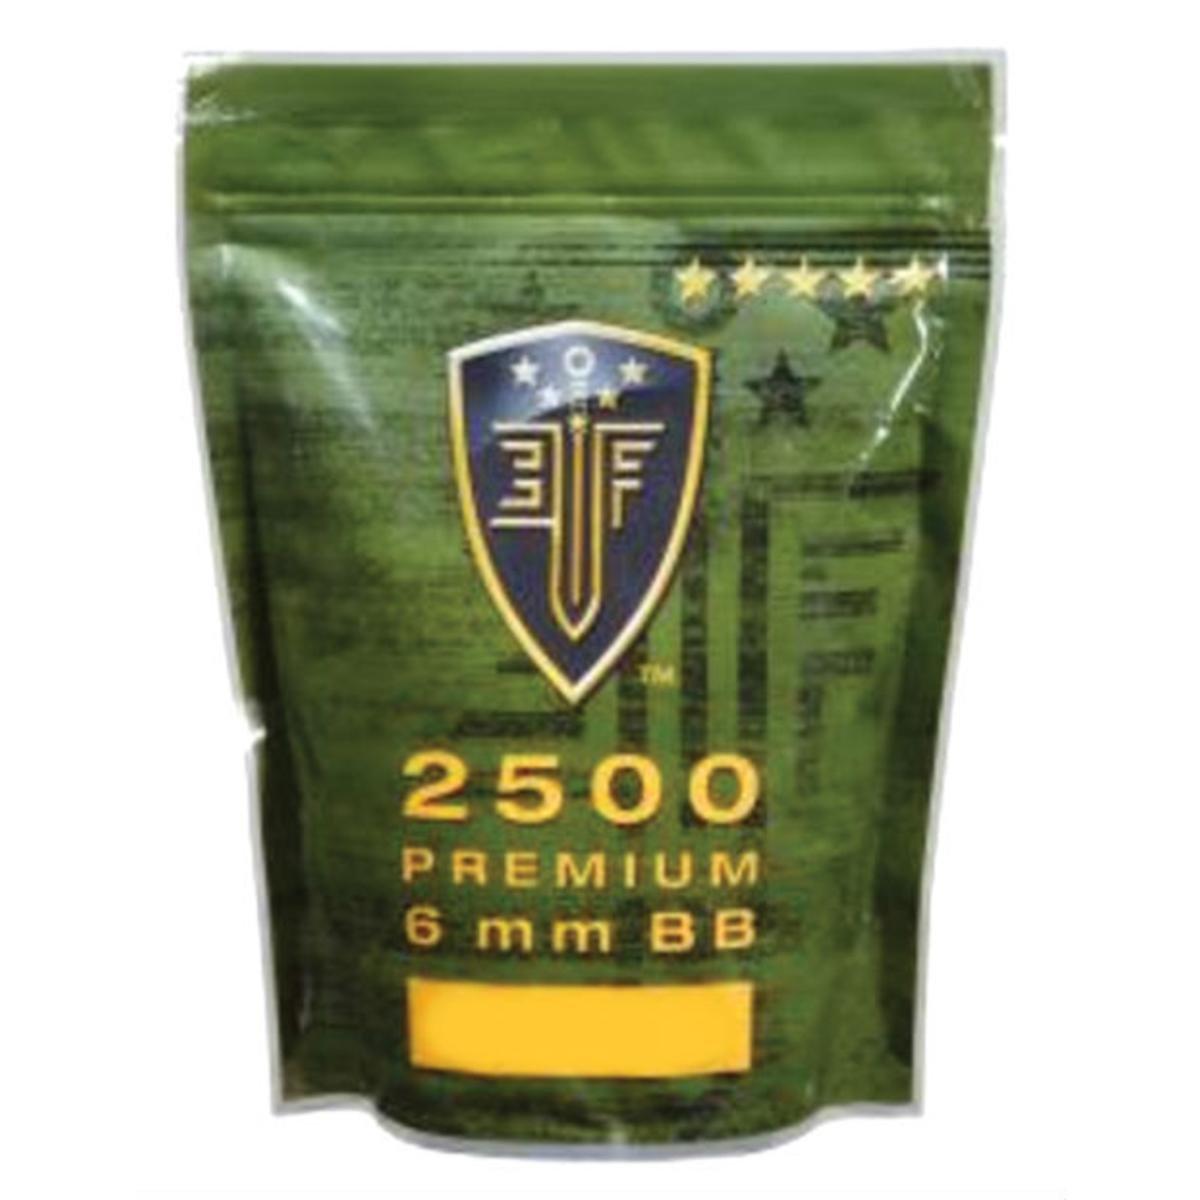 Umarex Elite Force Airsoft plastique BBS 0.25 g Zip Sac 2500